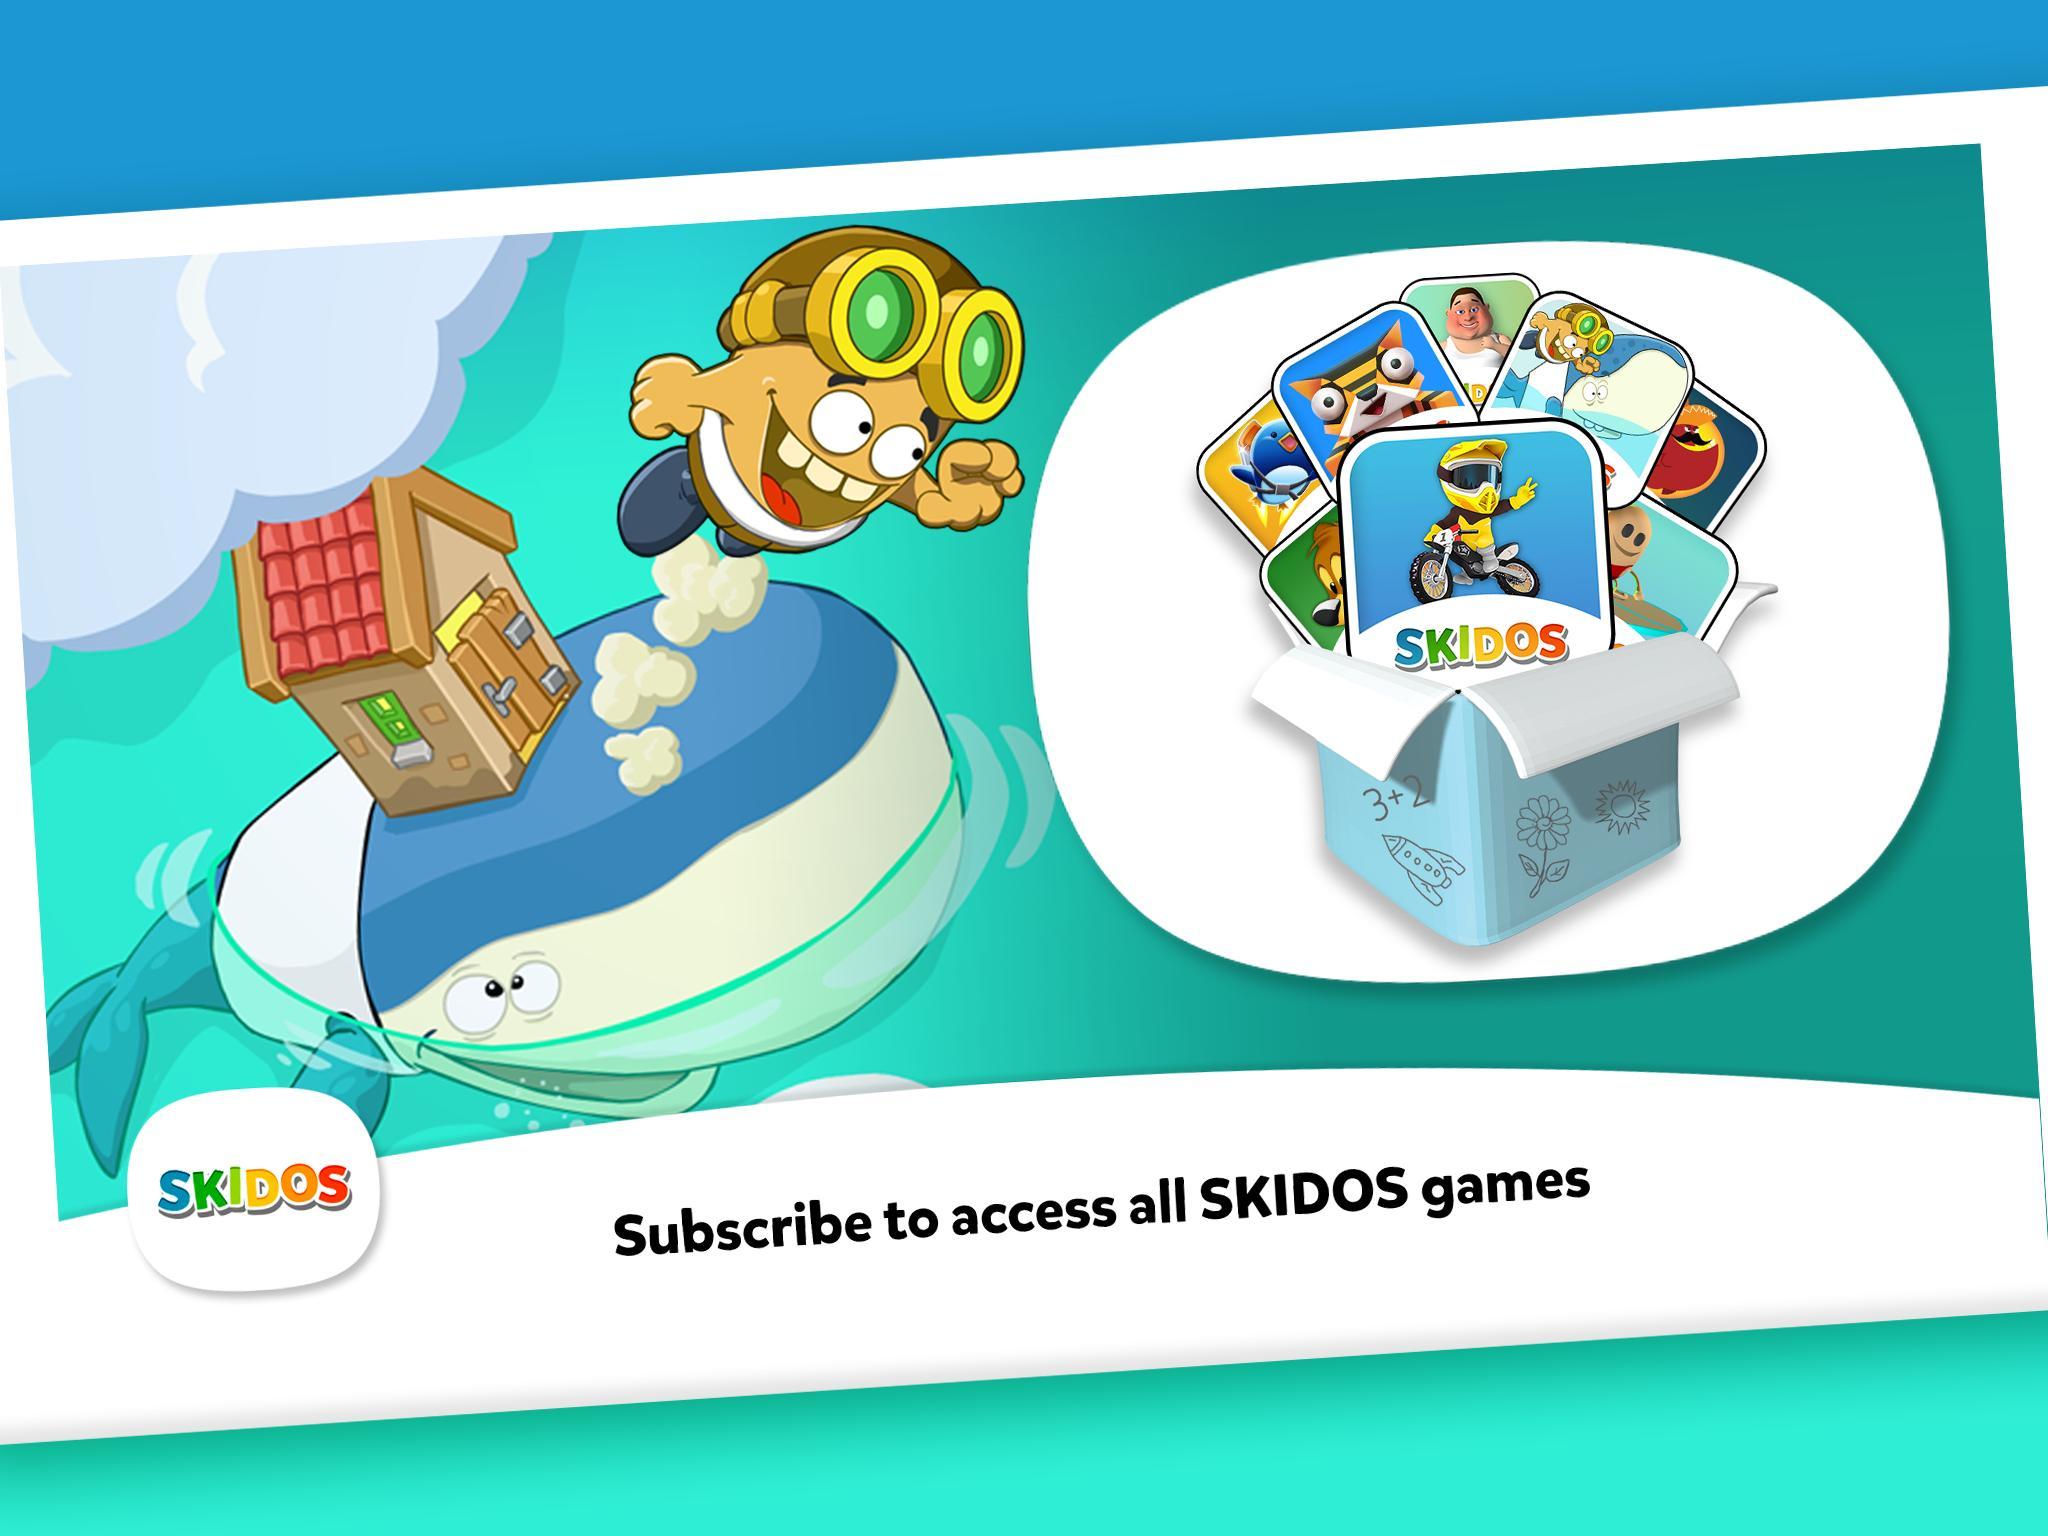 1 2 3 4 5 math games star wars battlefront 2 games online for free